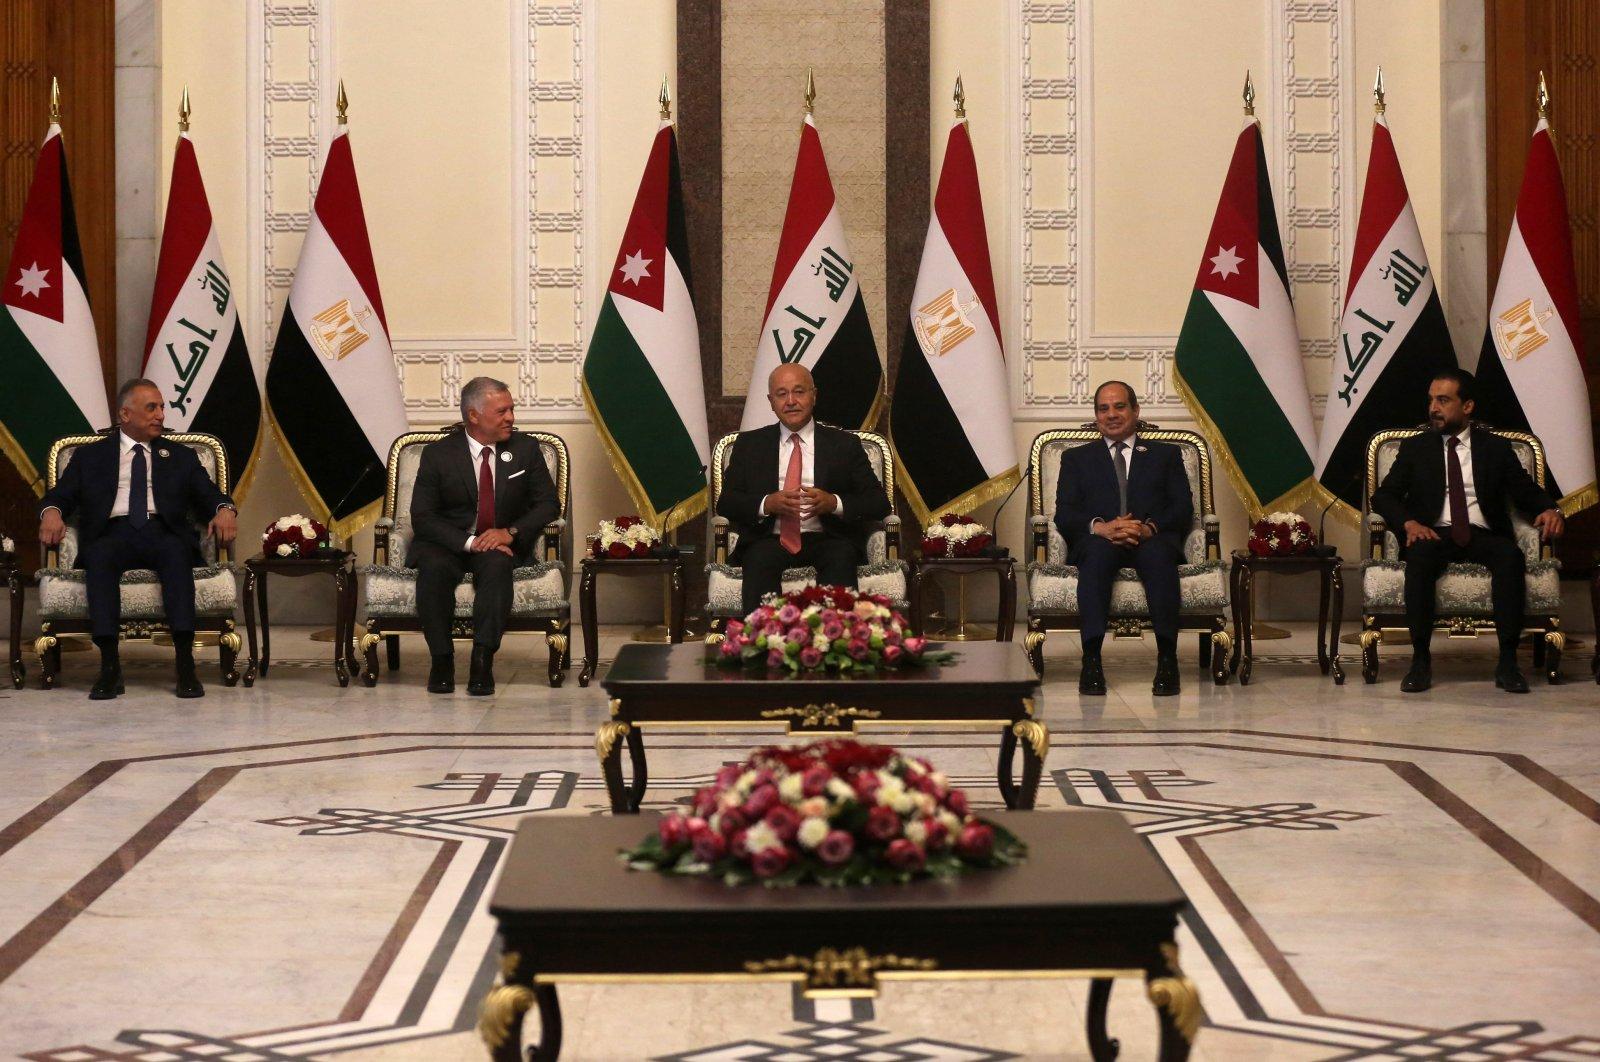 Iraqi President Barham Saleh (C), Prime Minister Mustafa Al-Kadhimi (L) and Parliament Speaker Muhammad Al-Halbousi (R) receive Egypt's President Abdel Fattah el-Sissi (C-R), and Jordan's King Abdullah II (C-L), in the capital Baghdad, Iraq, June 27, 2021. (AFP Photo)